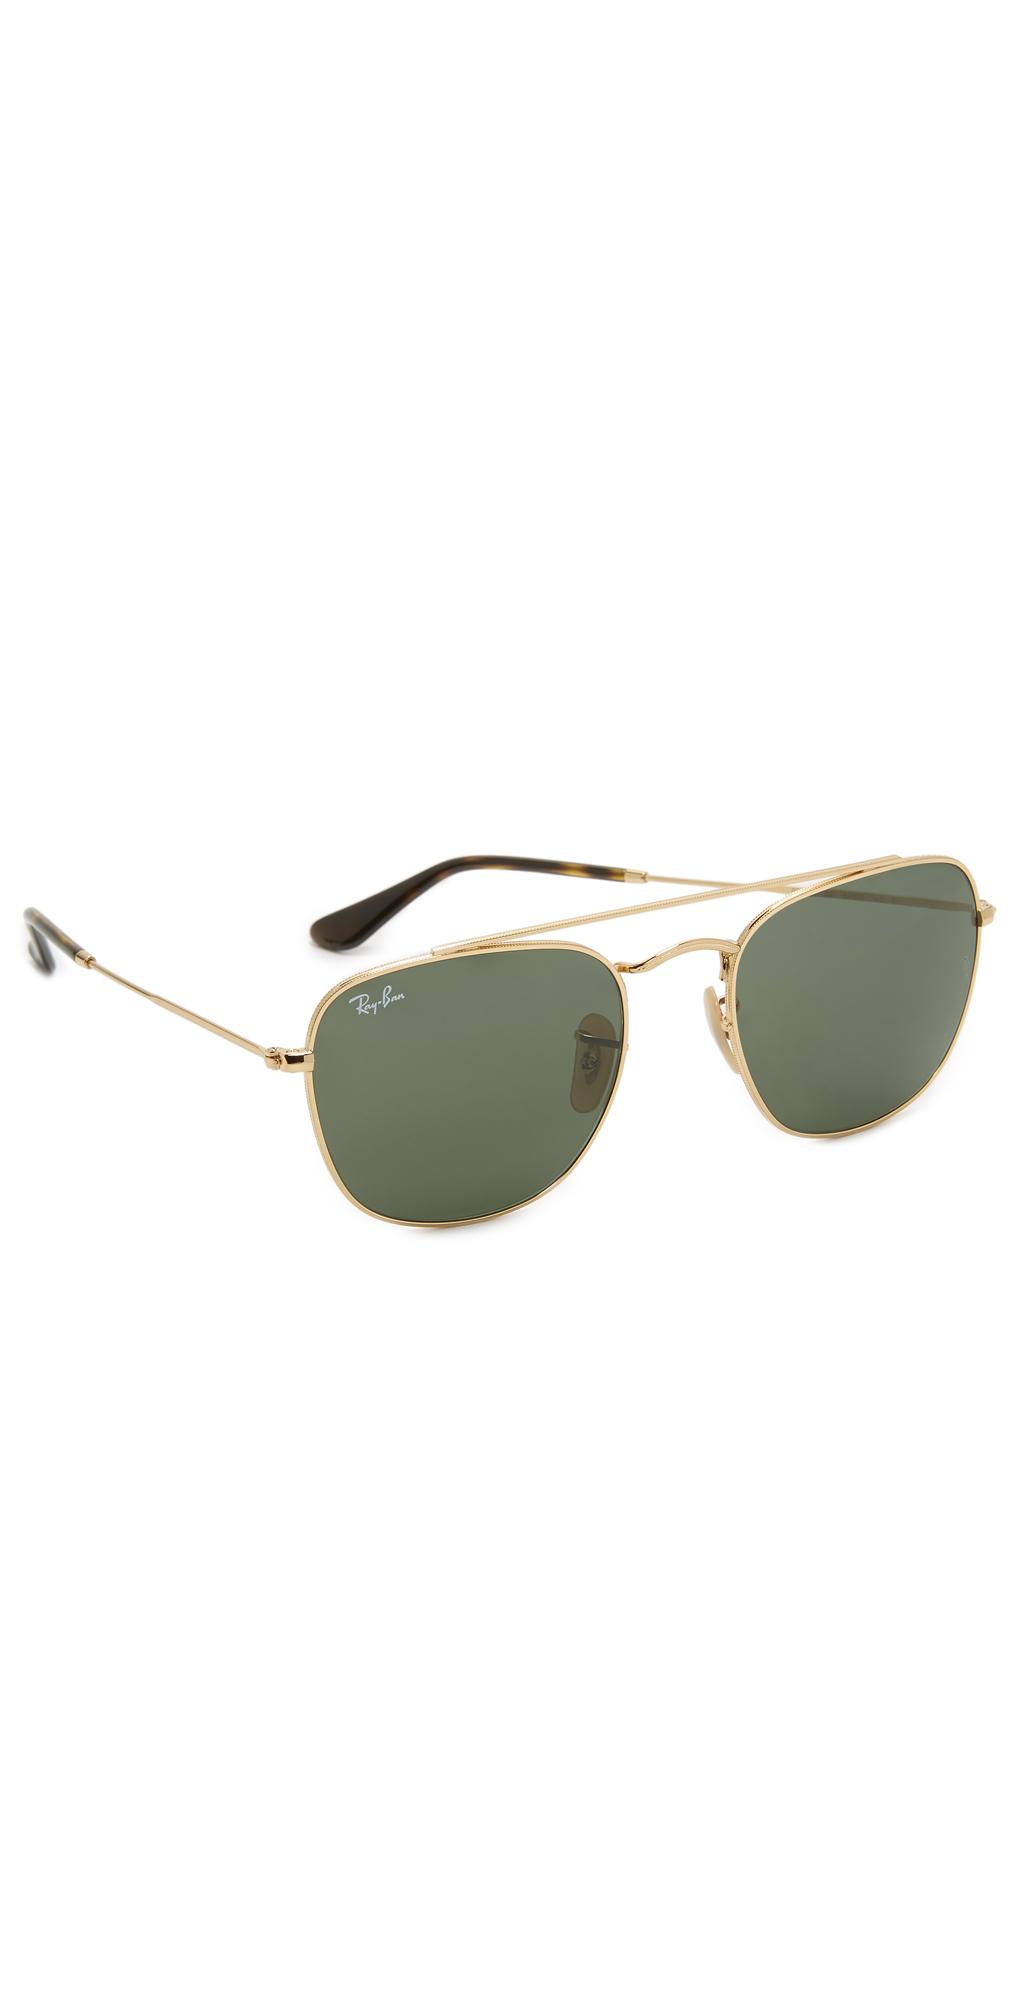 Square Aviator Sunglasses Ray-Ban